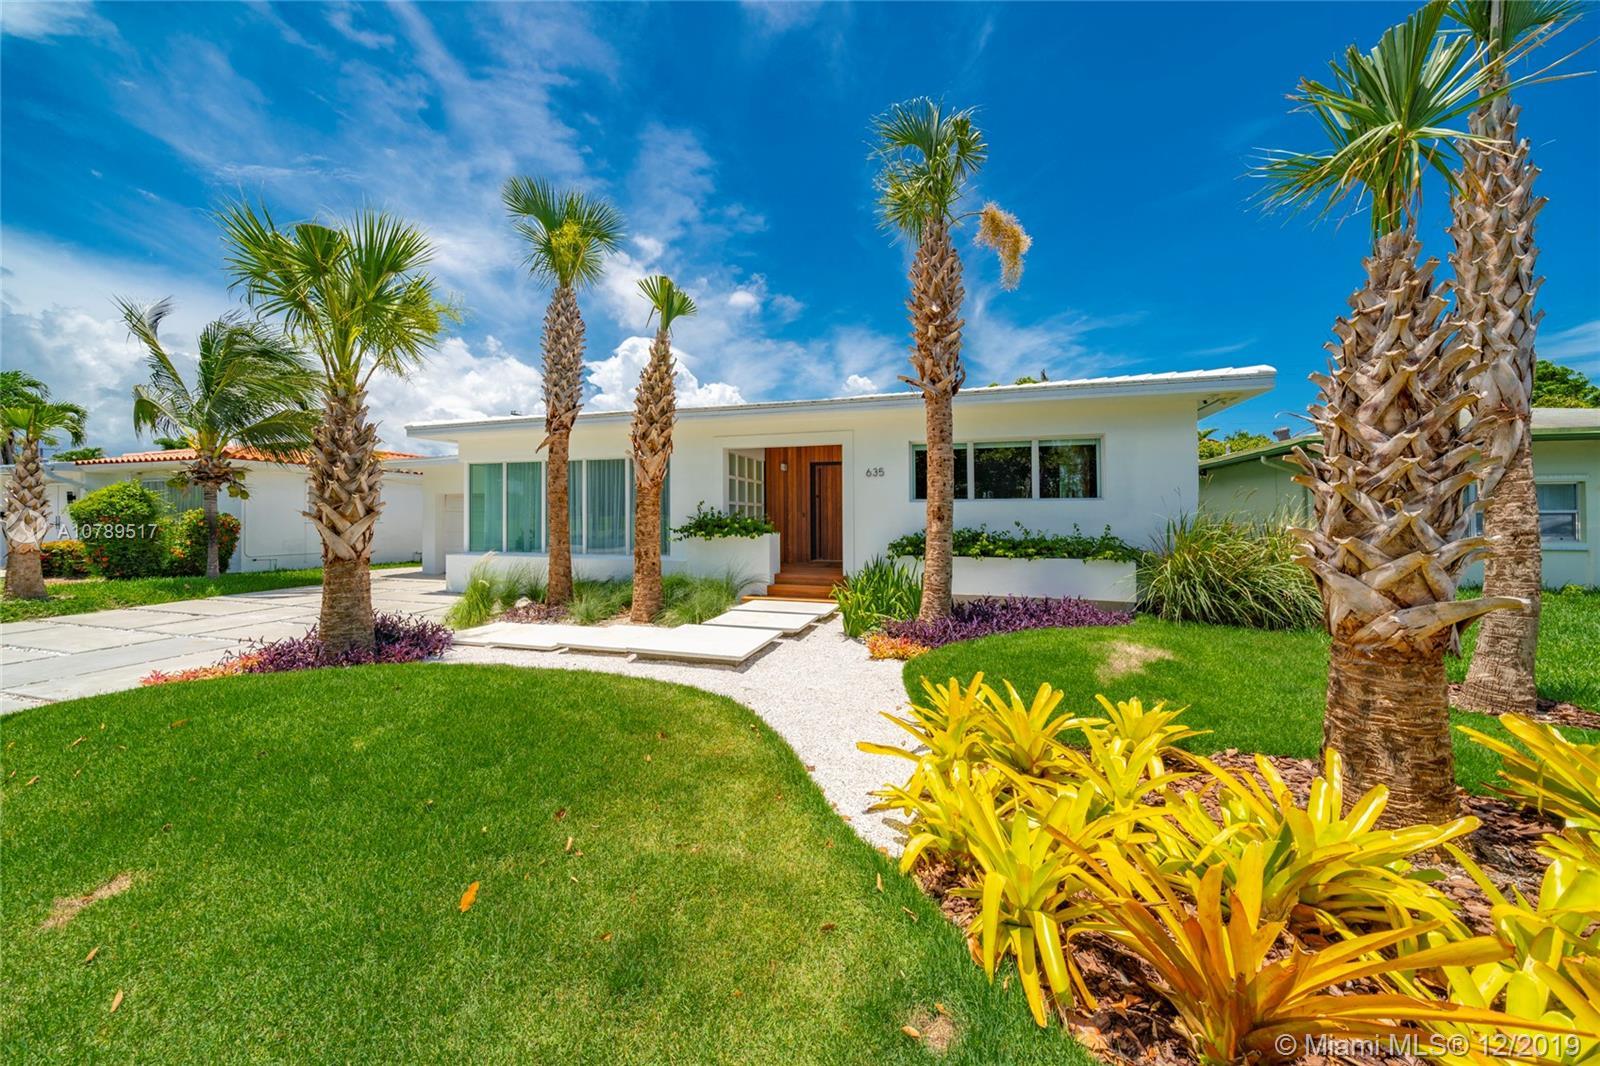 635 Fairway Dr - Miami Beach, Florida